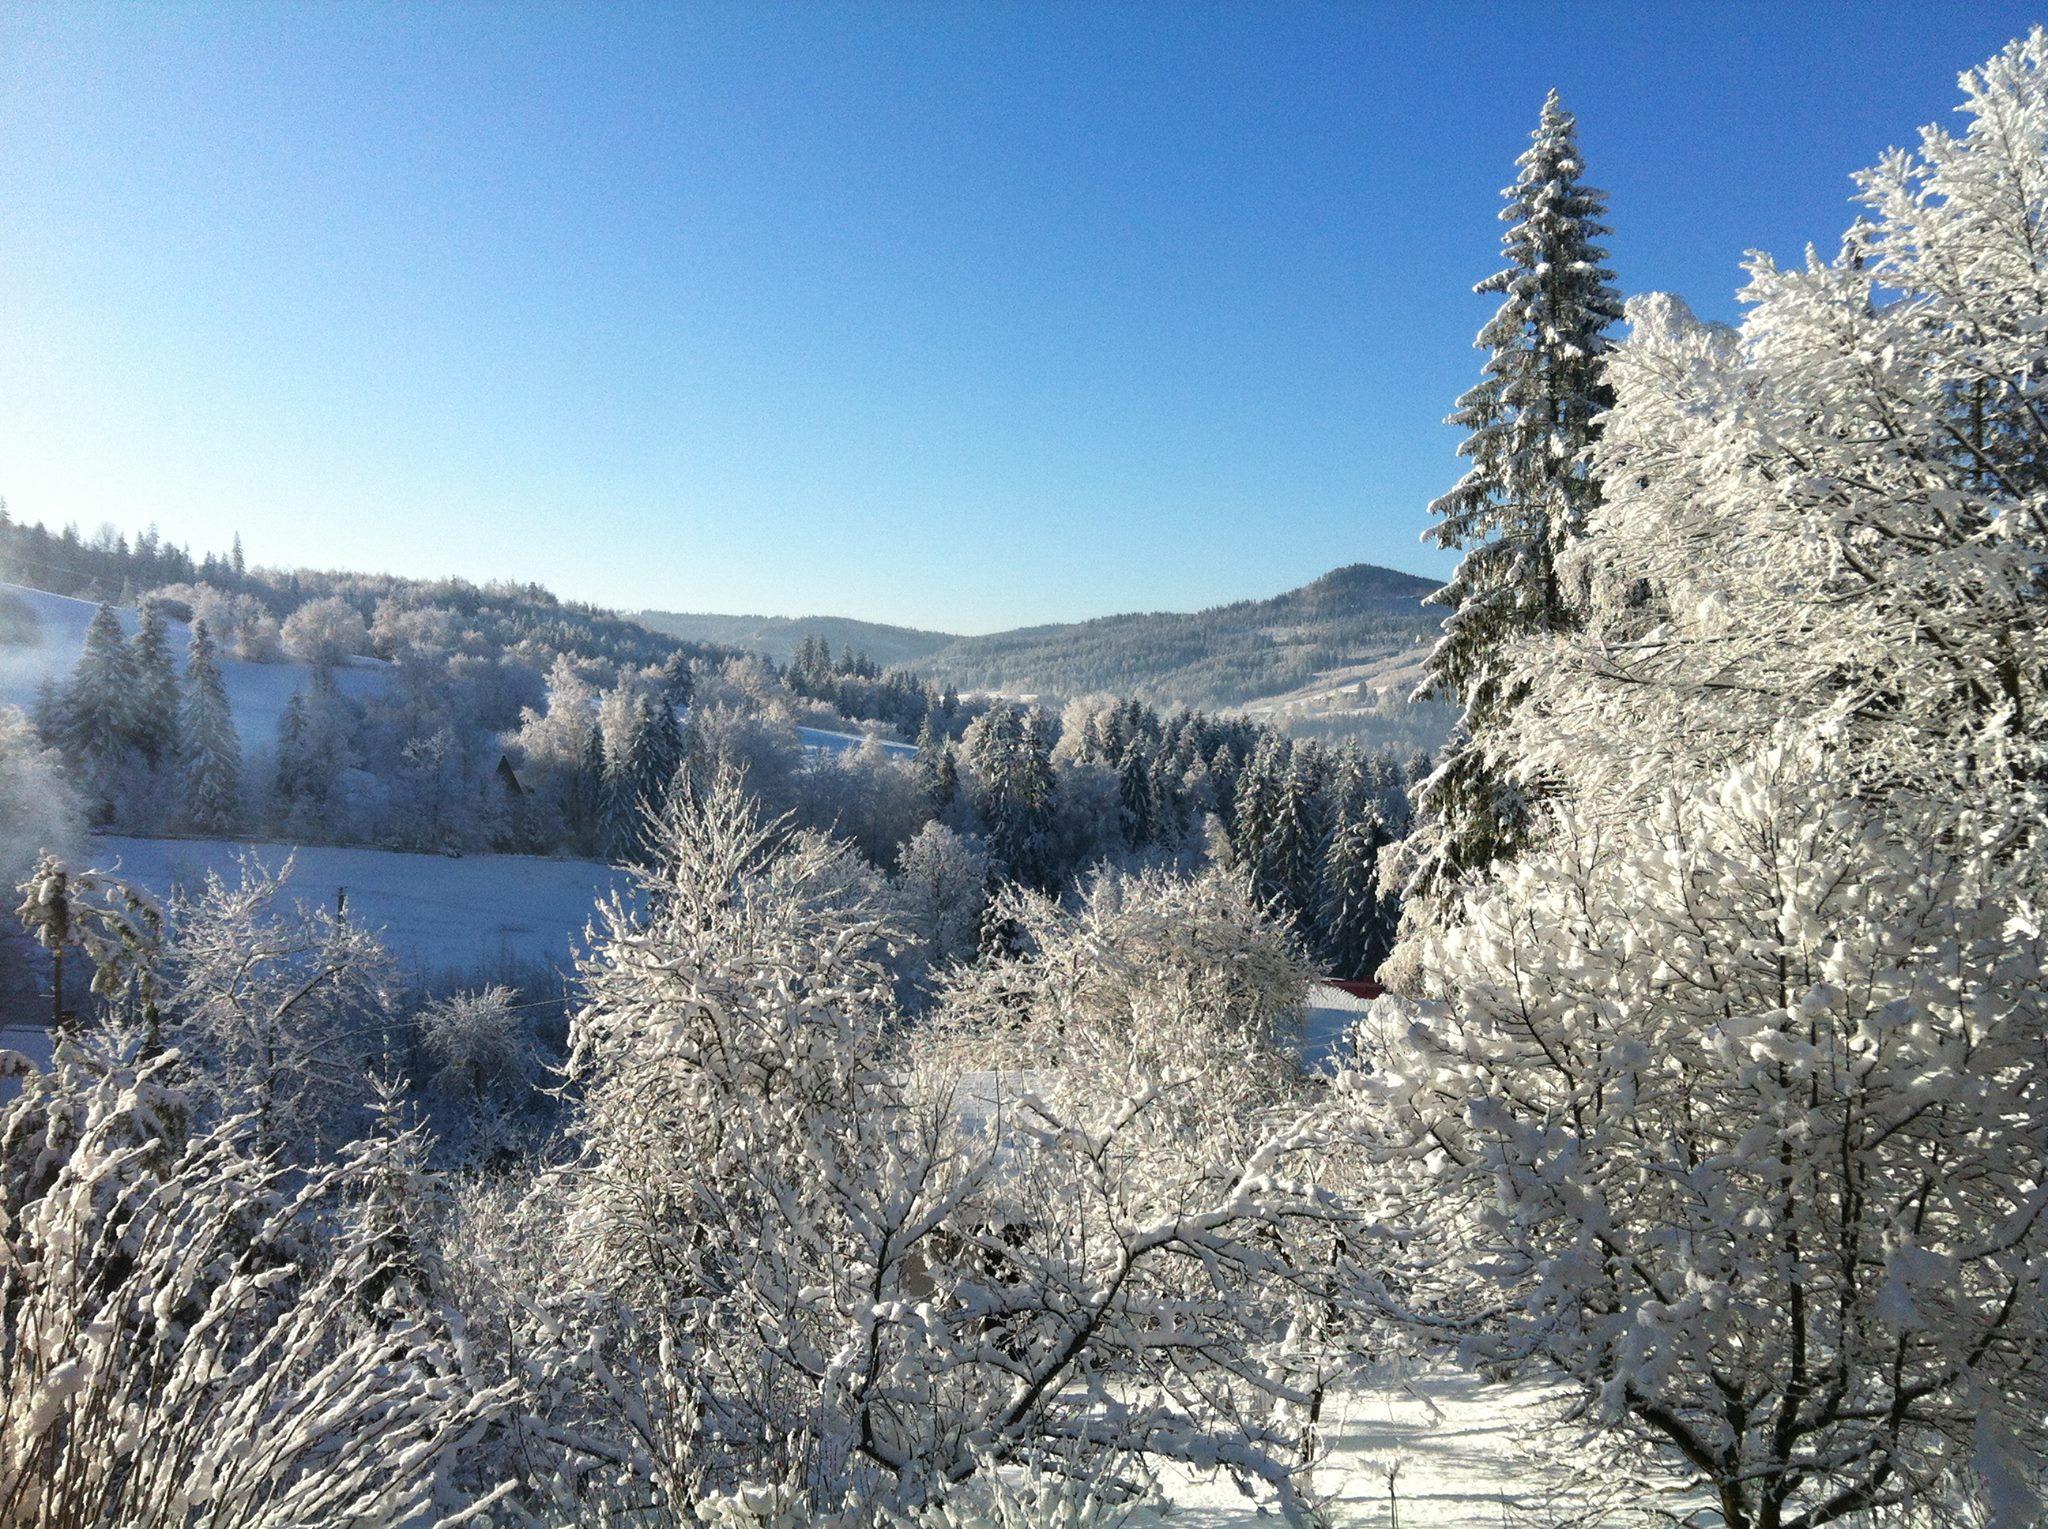 Mroźna zima U Wujcia Wisła Partecznik 20a Noclegi, Kwatery, Pensjonat